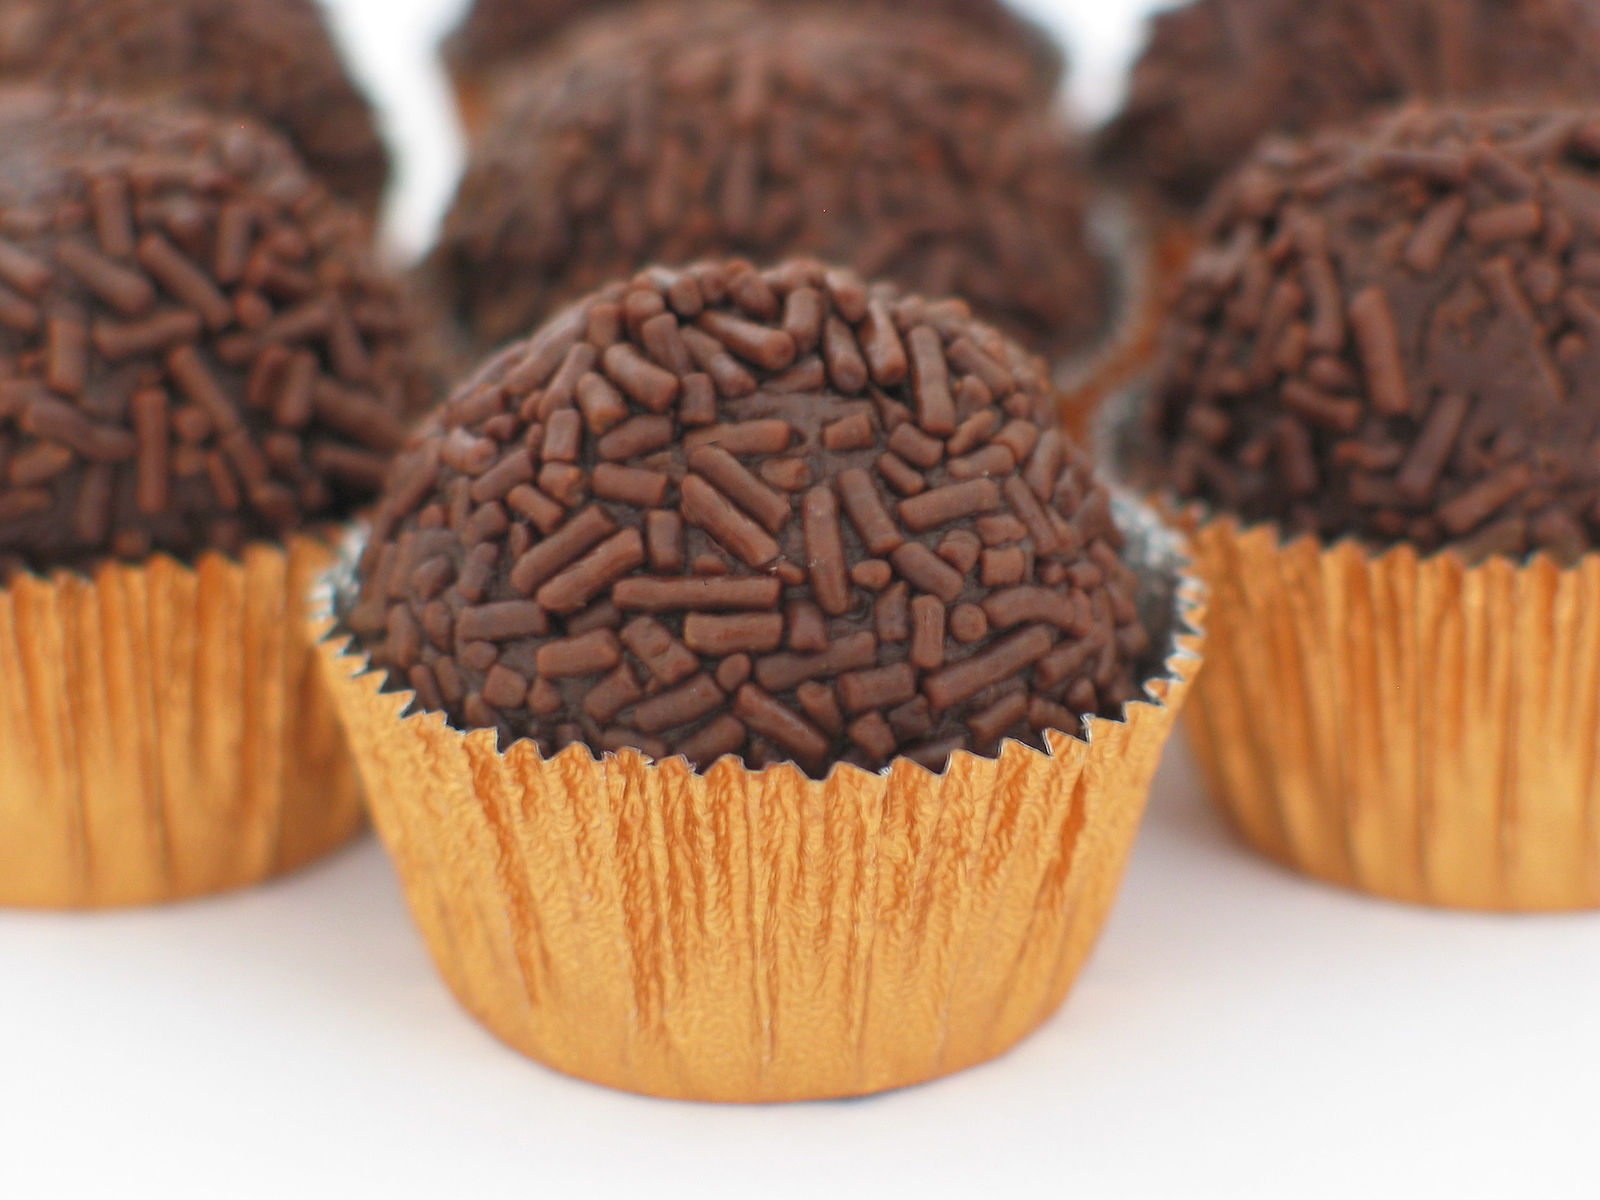 brigadeiro popularny brazylijski deser